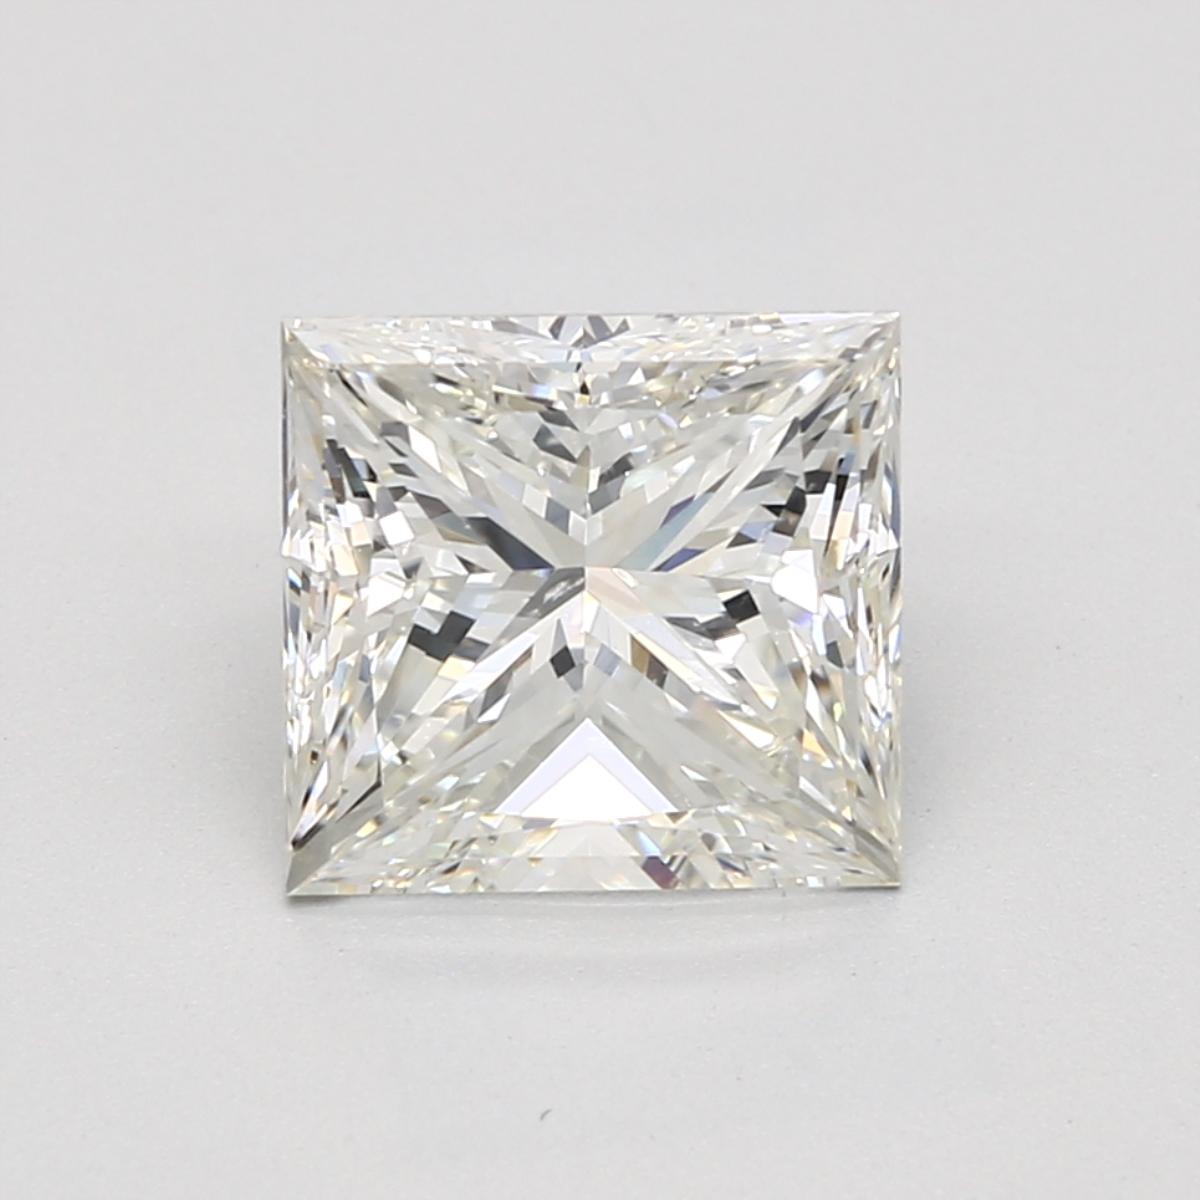 3.38 carat Princess Diamond, Very Good cut, graded by the GIA laboratories.